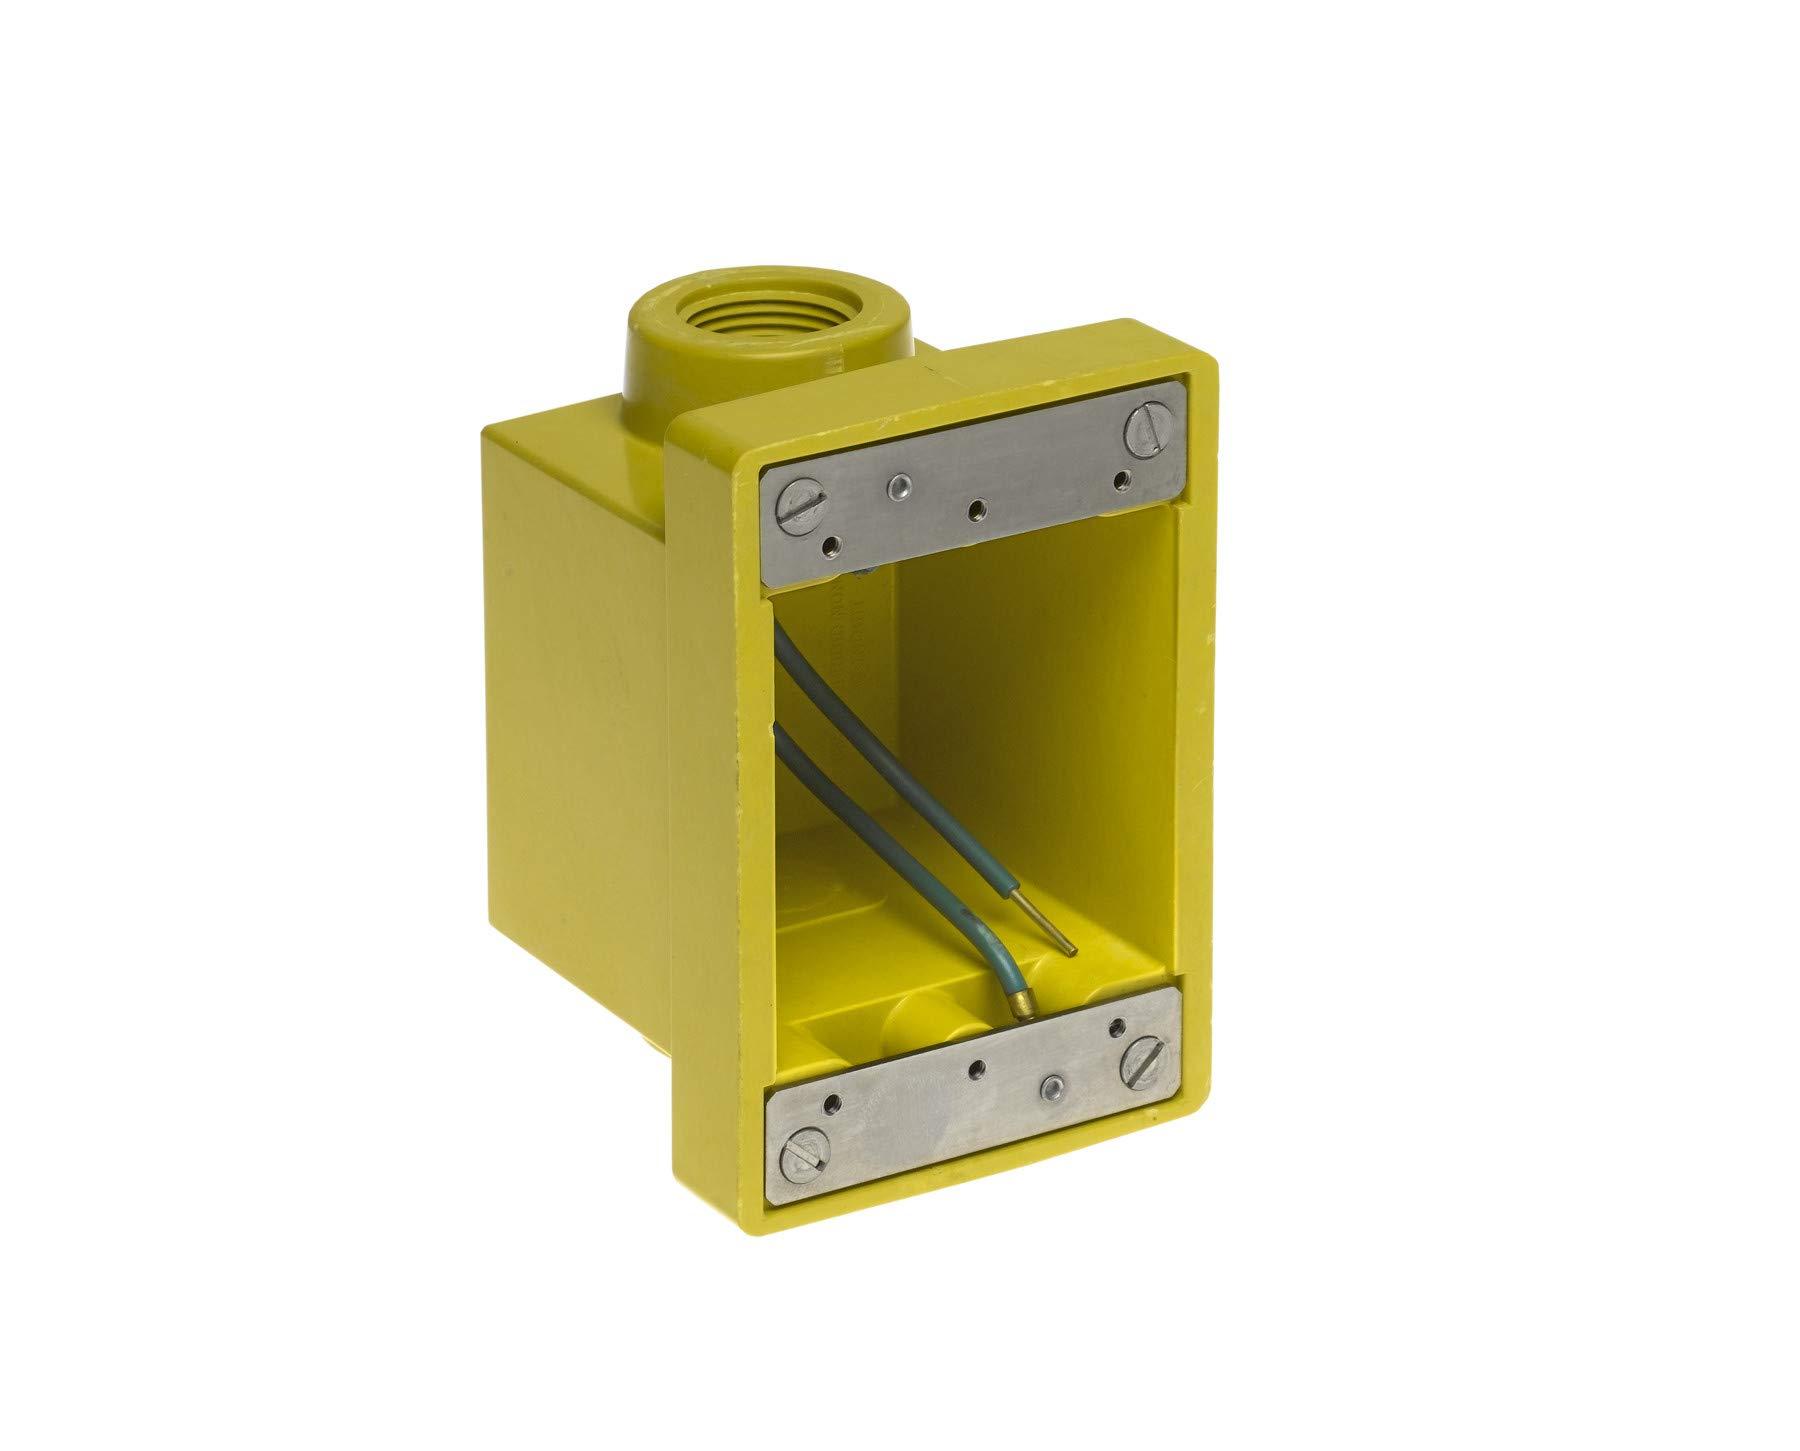 Woodhead 454CR Watertite FD Box, 2 Knockout Openings, Yellow, 1'' Thread Diameter